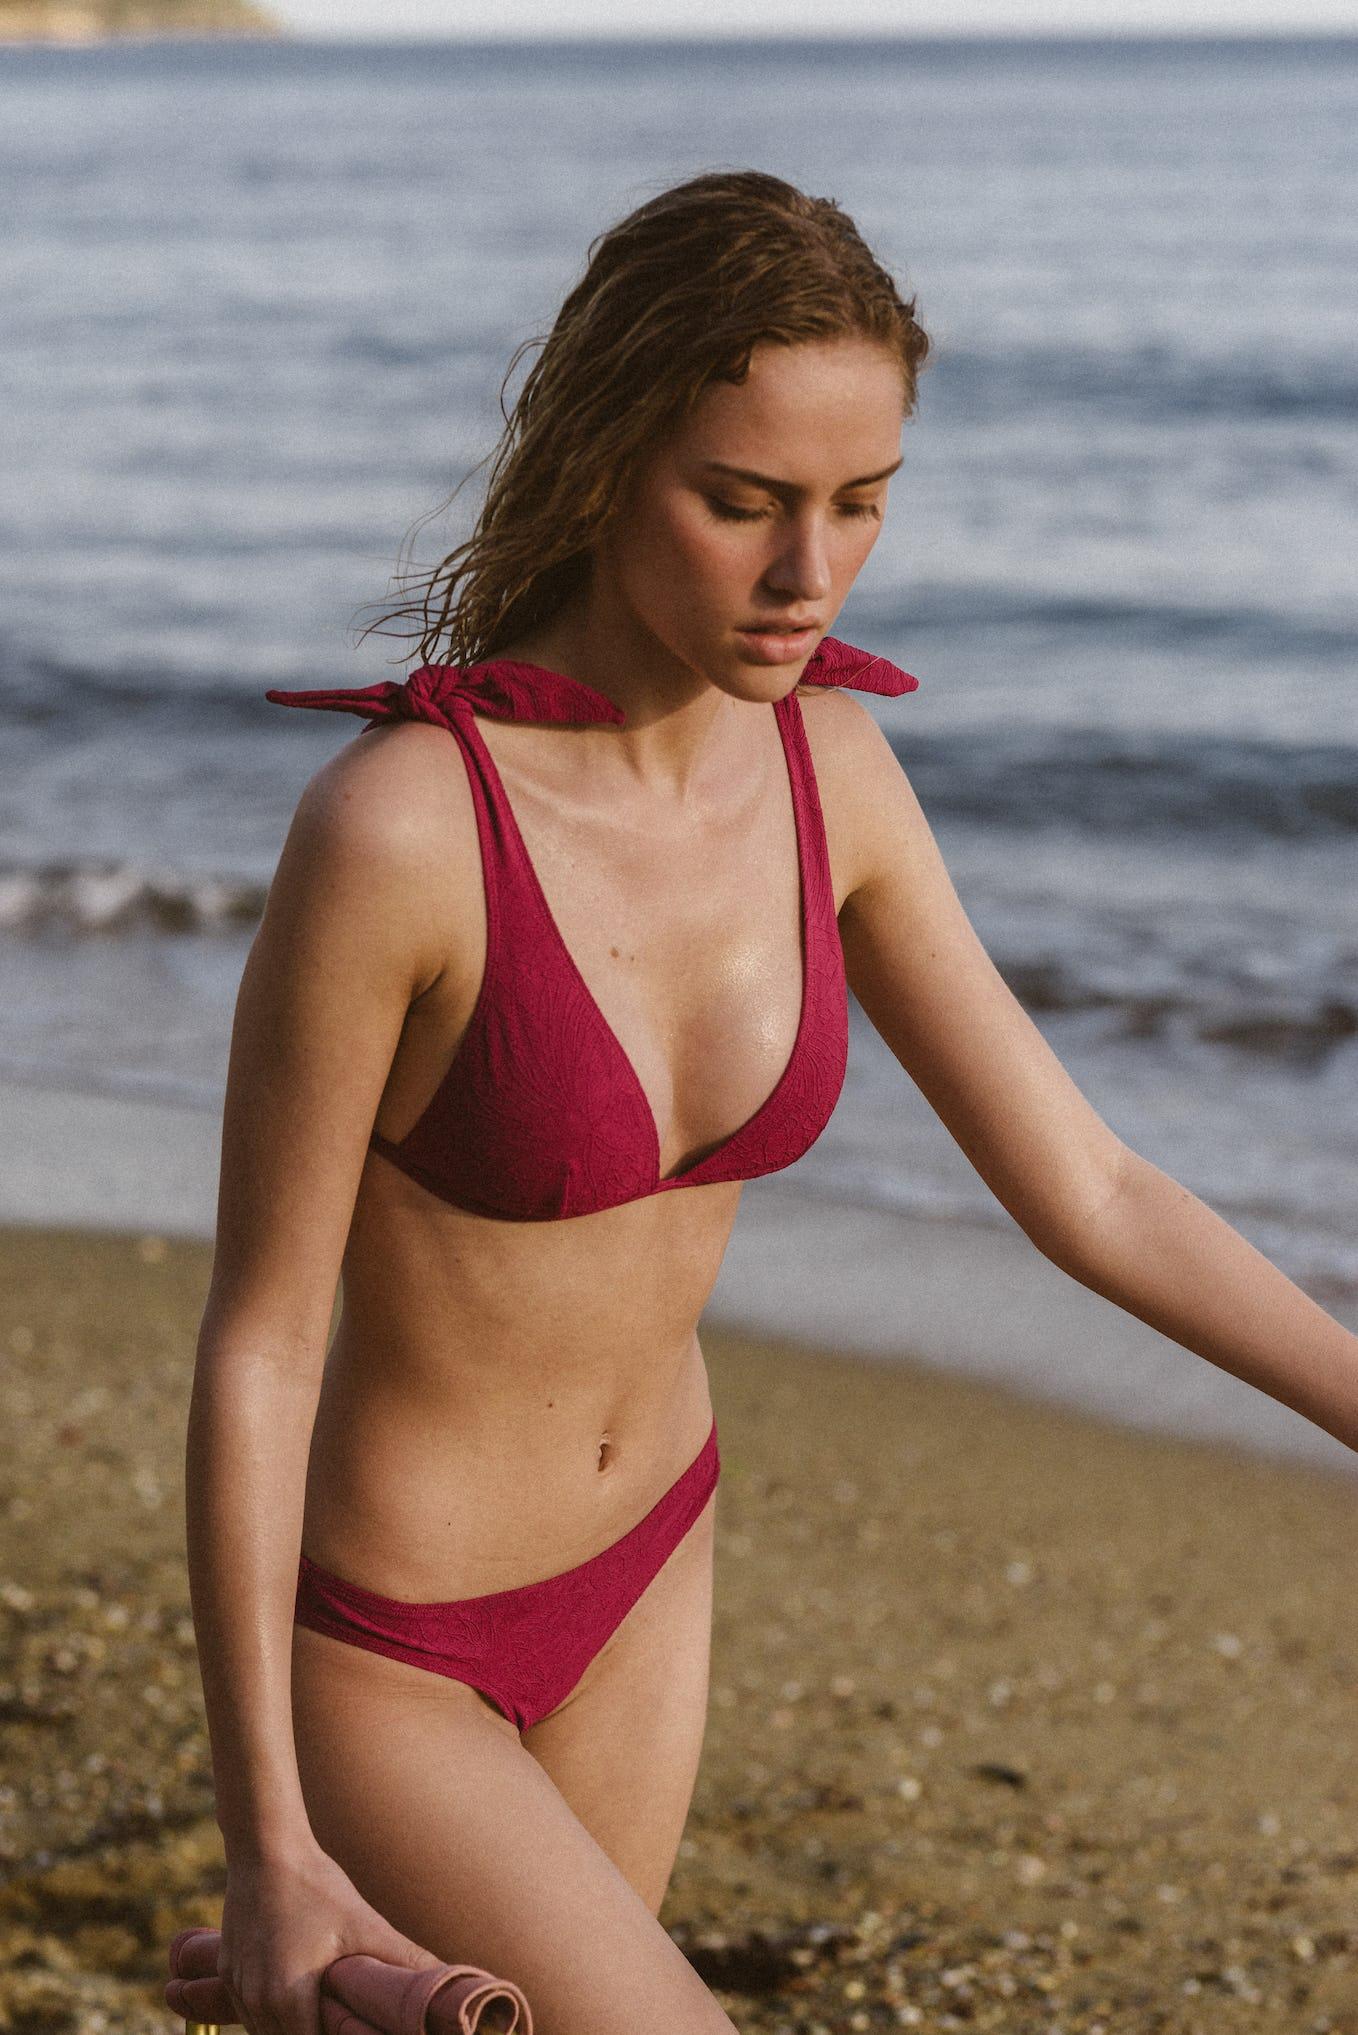 Swimsuit Sur le sable in fuchsia